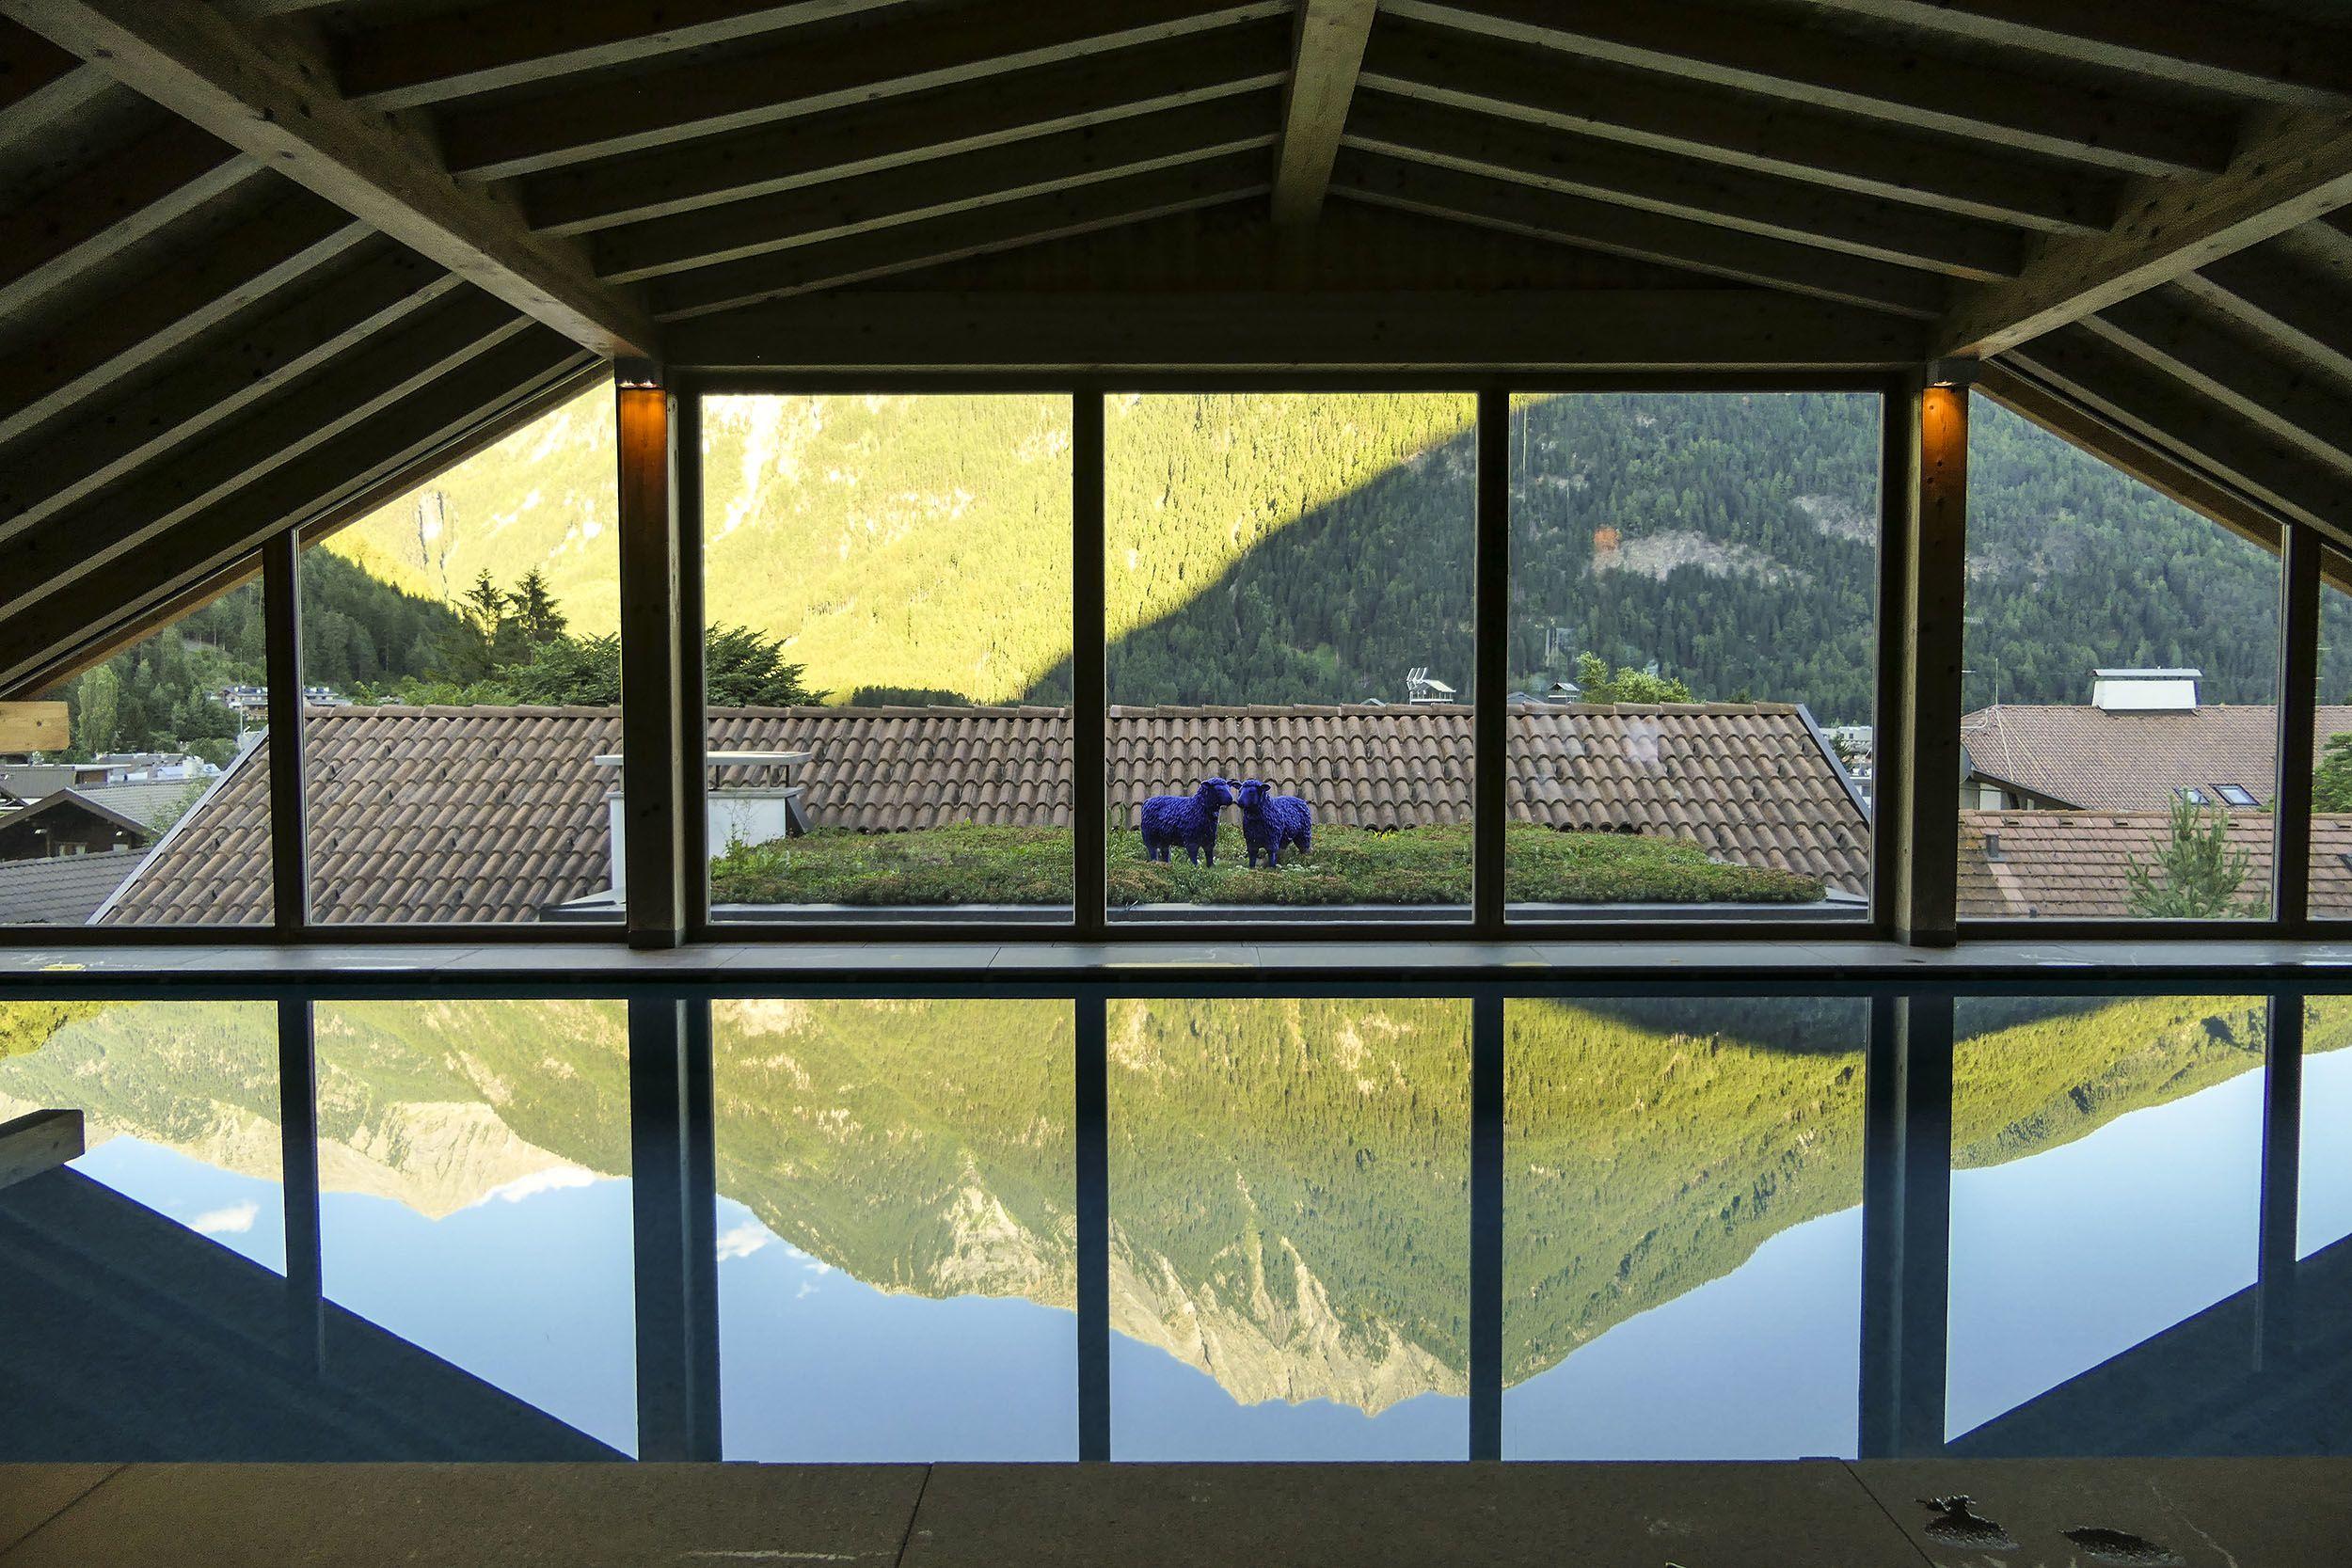 Wanderhotel Drumlerhof, Spa